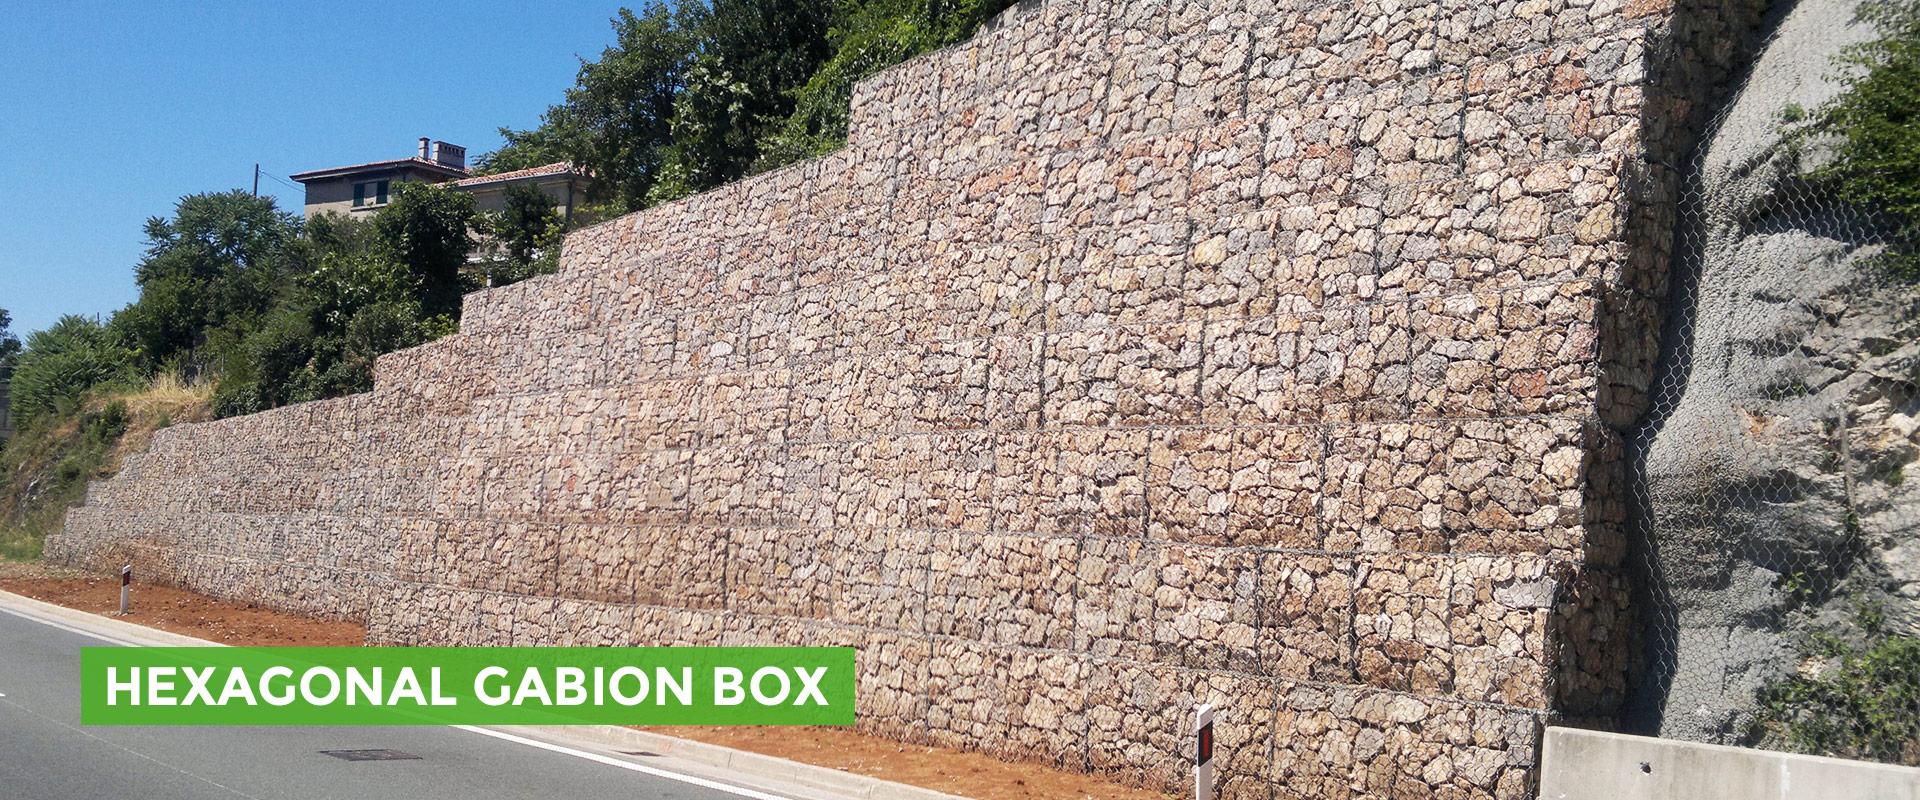 Hexagonal Gabion Box